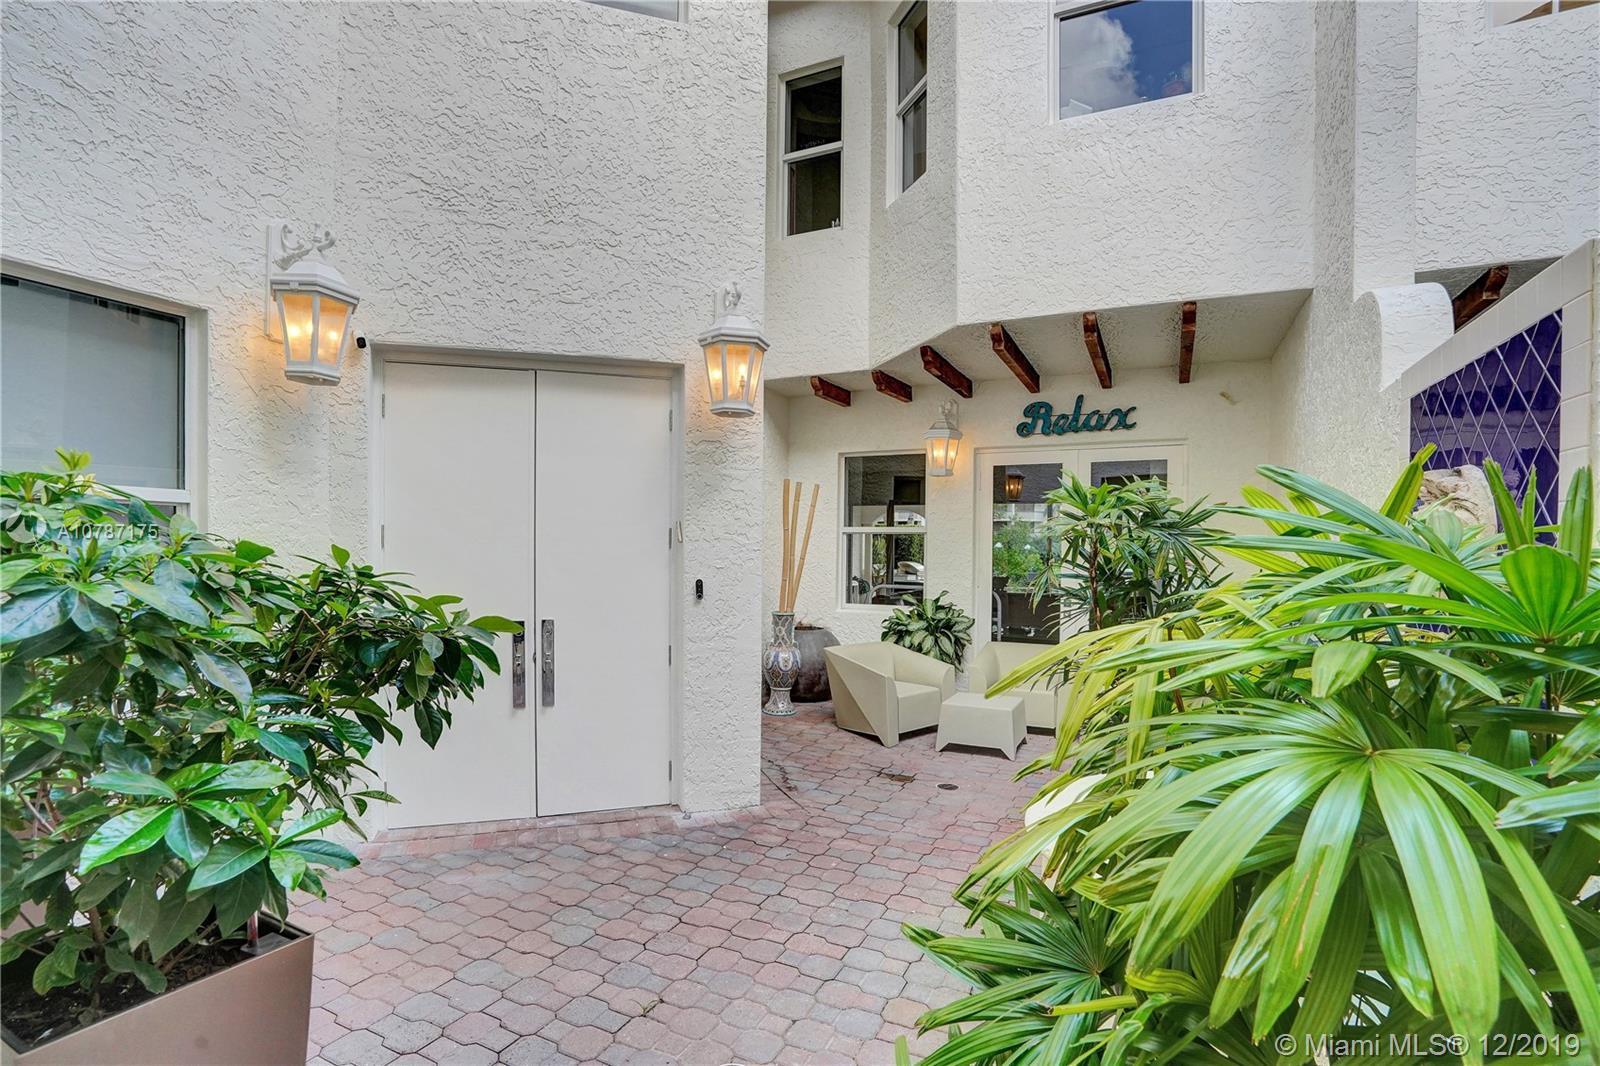 3750 NE 199th Ter #3750, Aventura, FL 33180 - Aventura, FL real estate listing